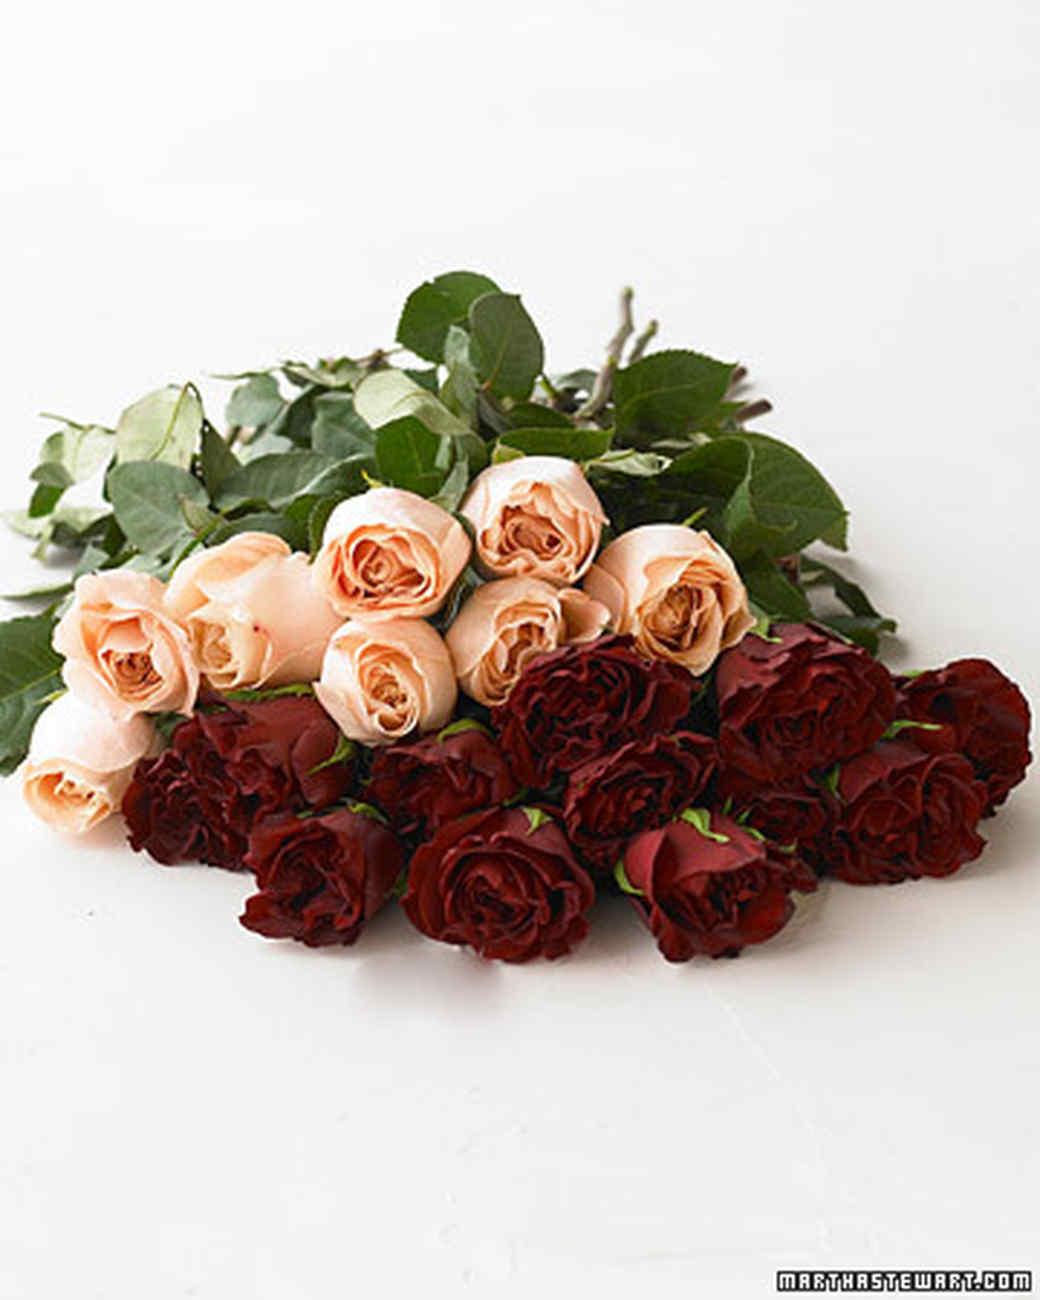 bd103521_0108_roses.jpg